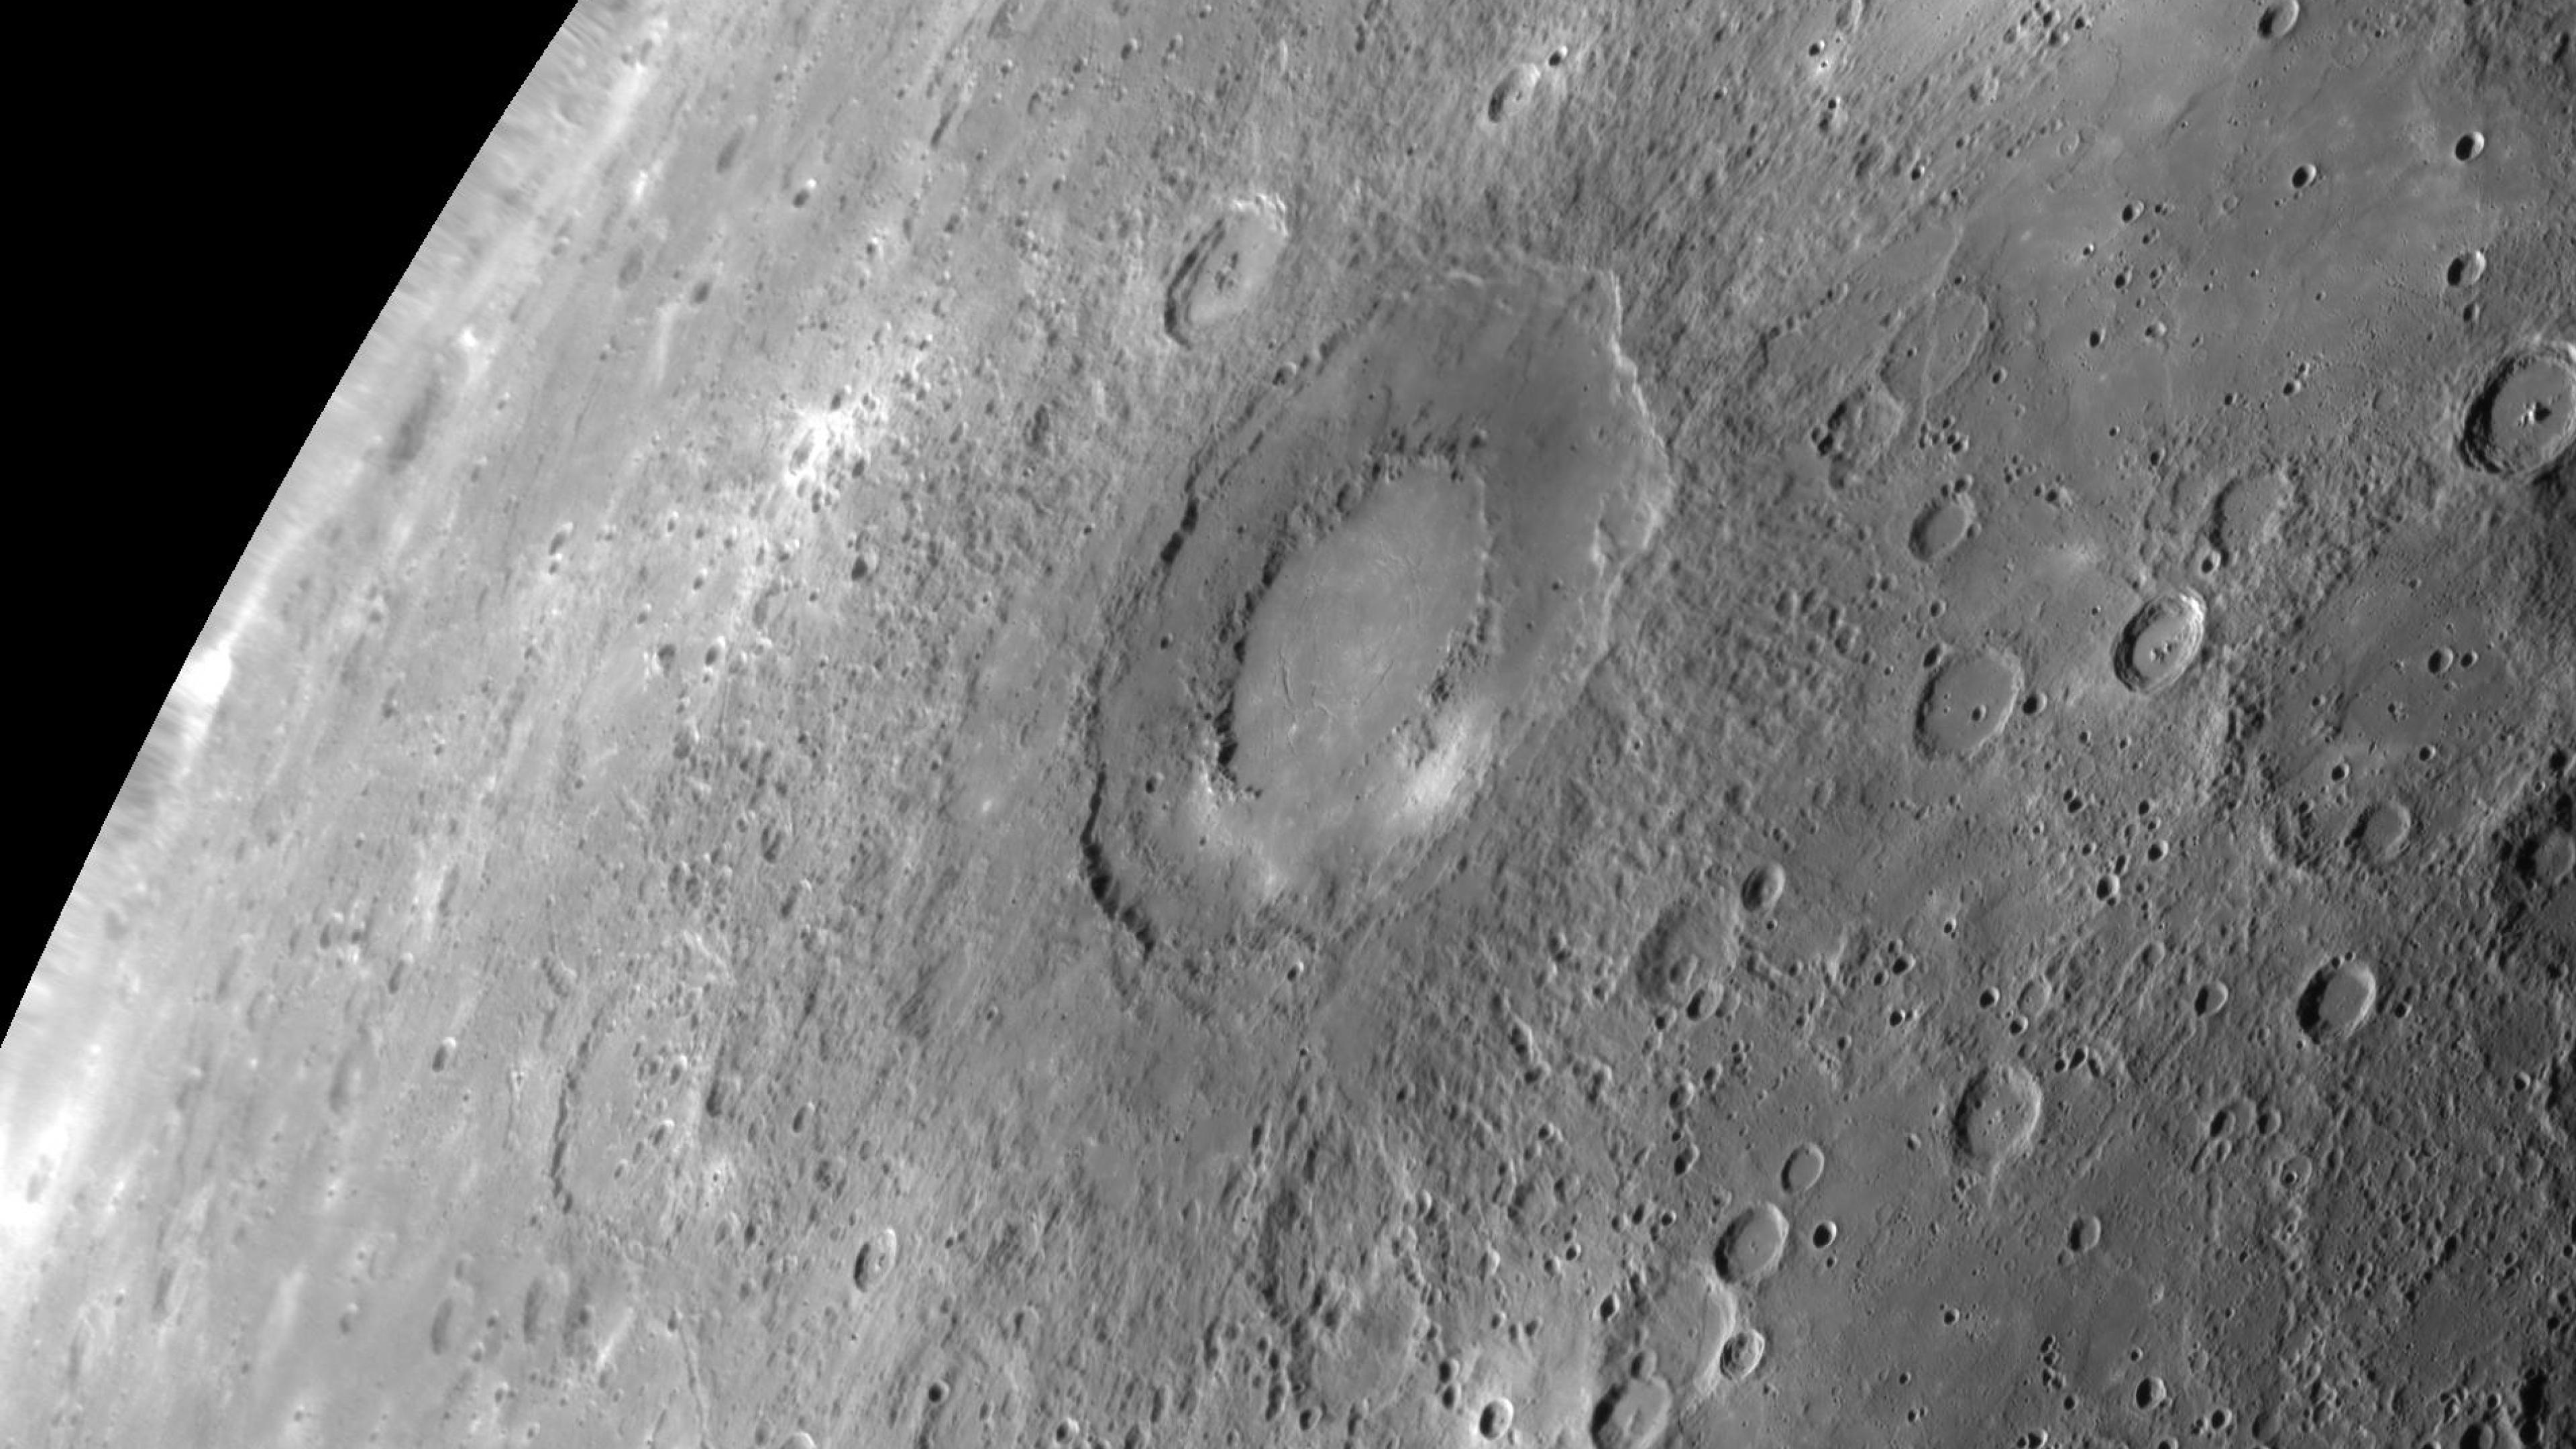 Download Wallpaper 3840x2160 Caloris planitia, Shock structure.